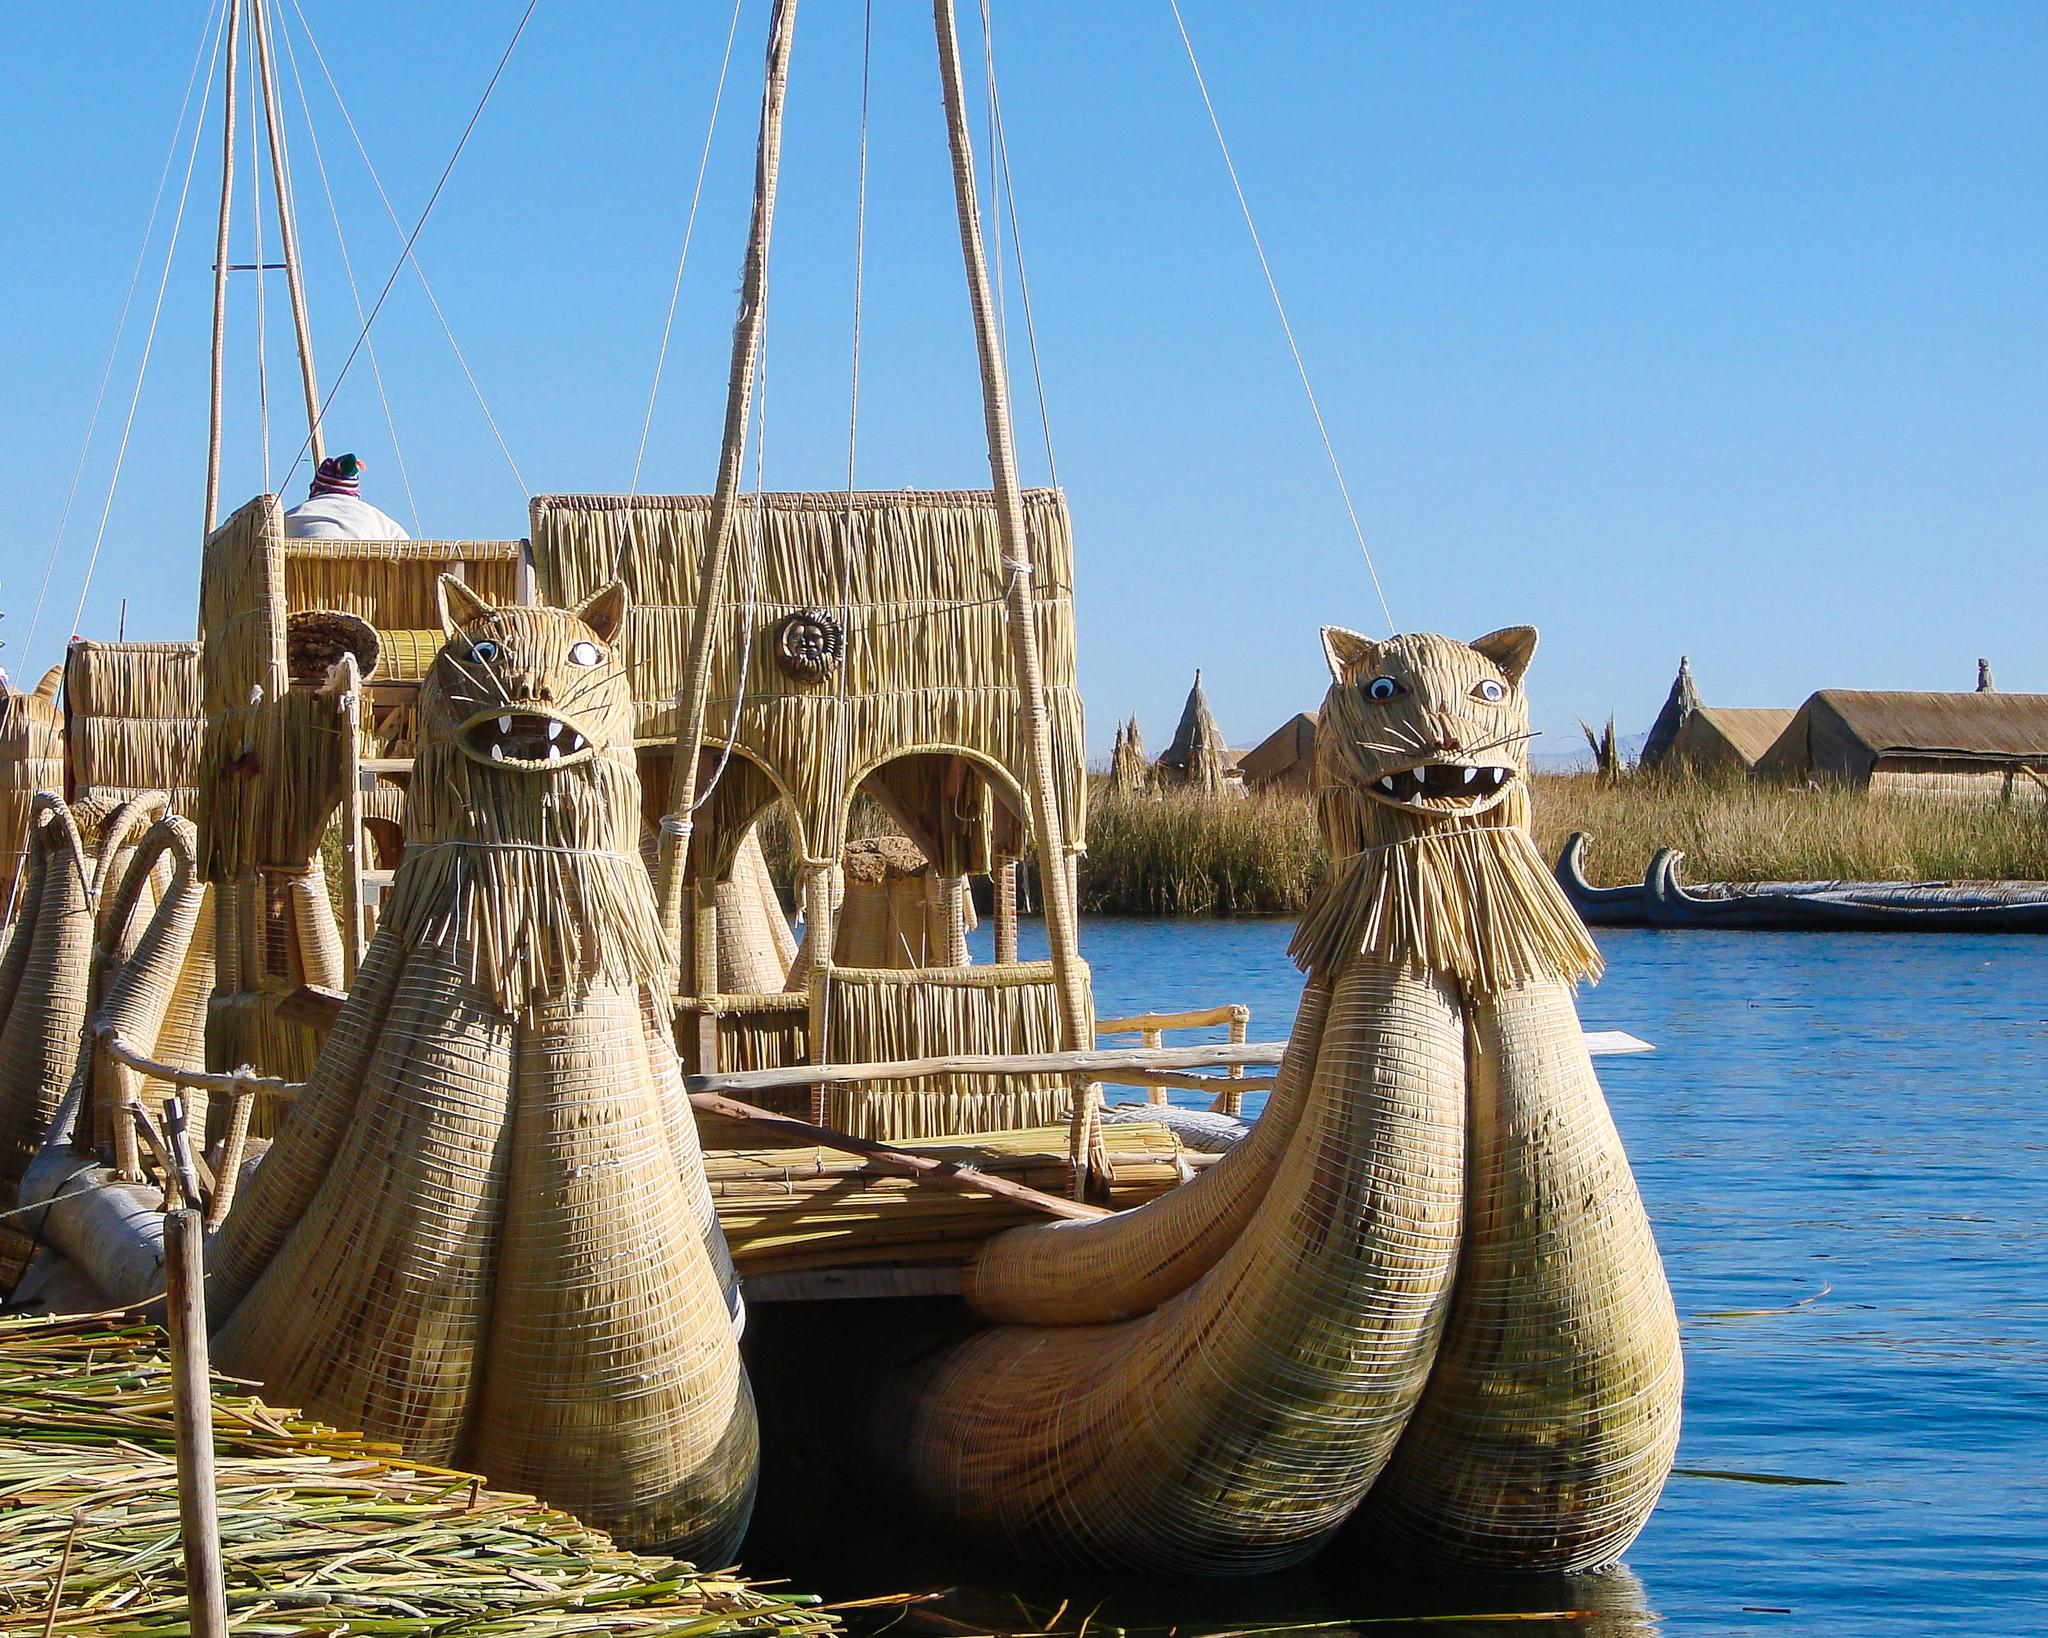 Reed Boats - Lake Titicaca